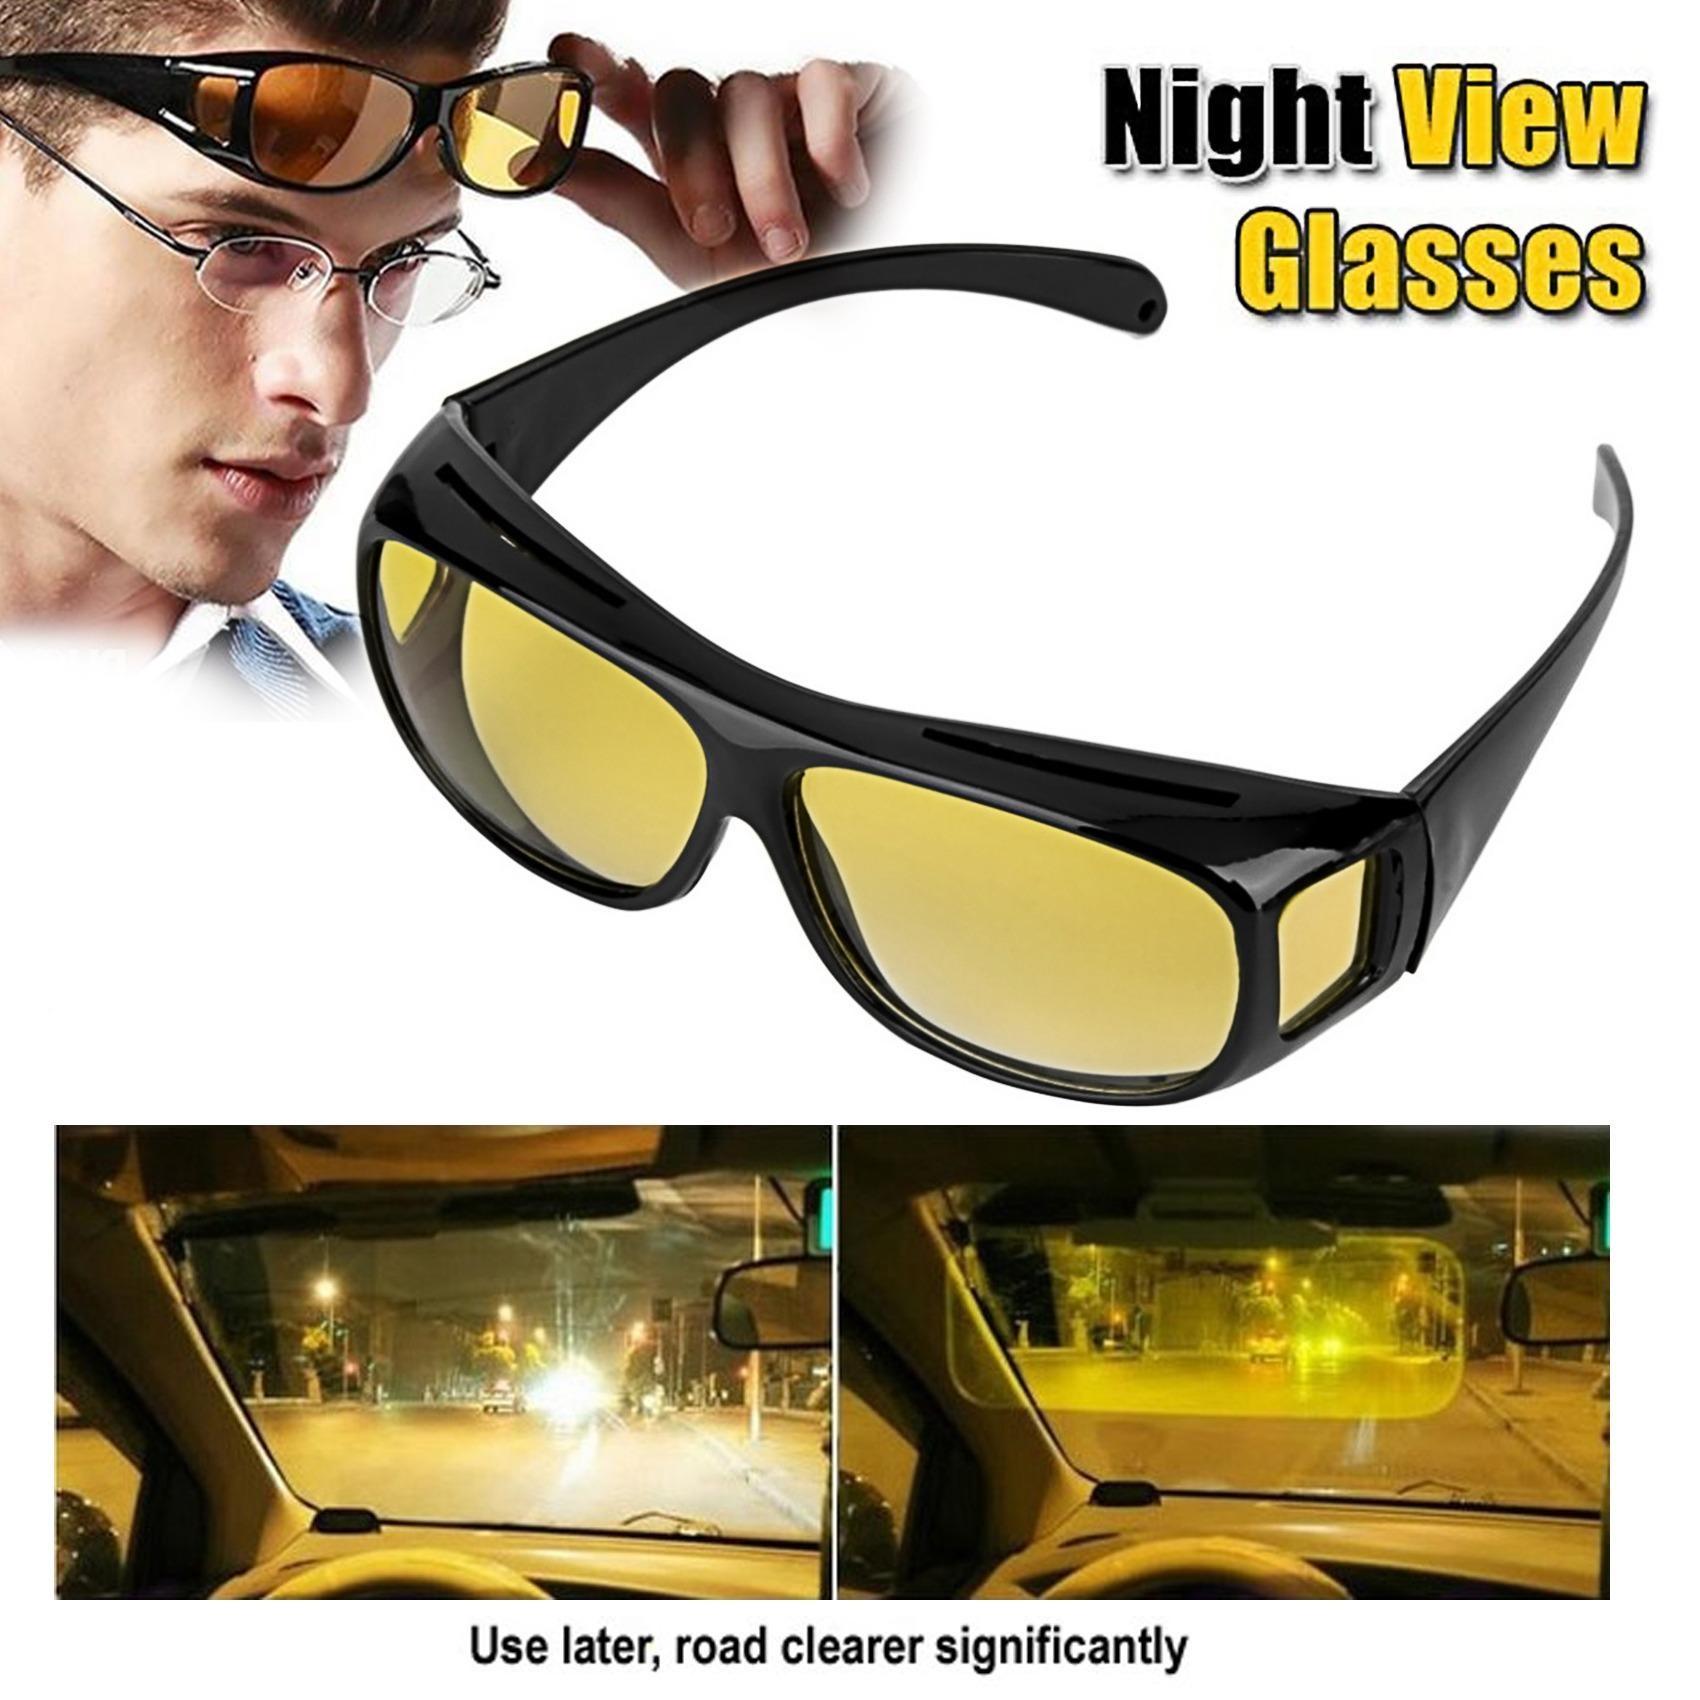 Night Vision sunglass for every night